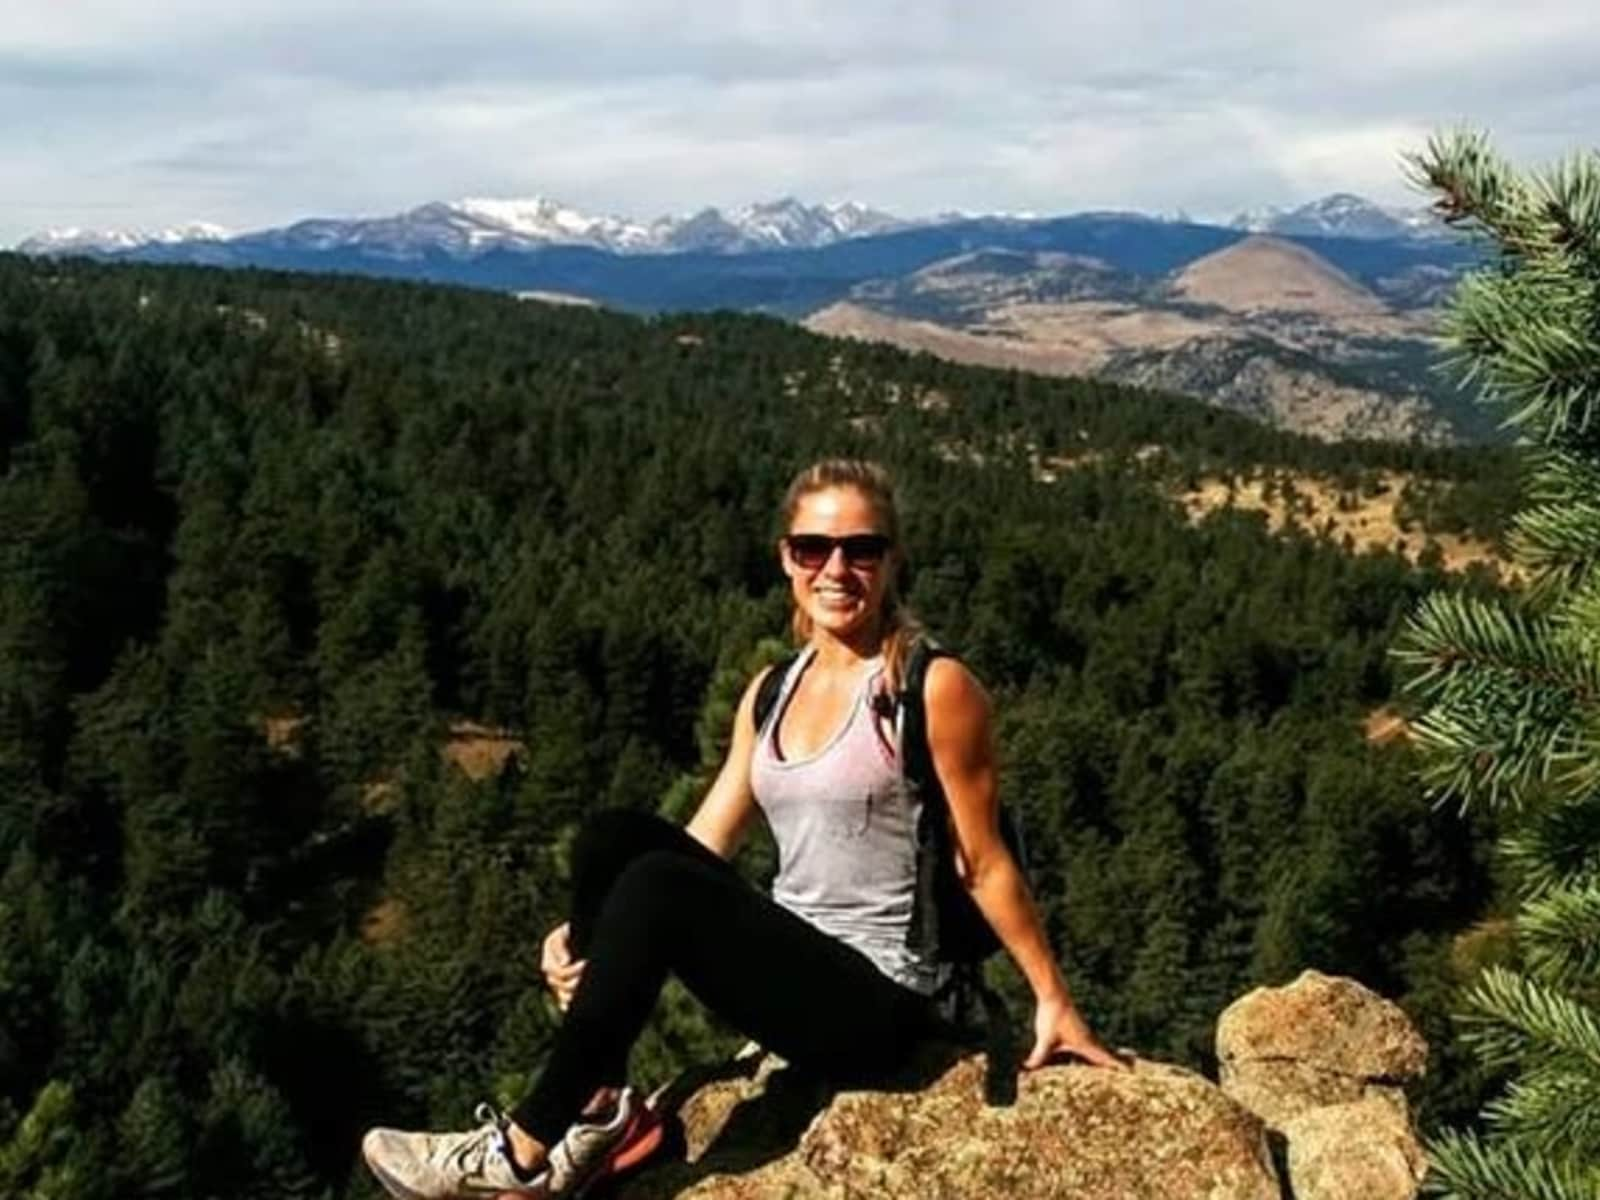 Nikki from Denver, Colorado, United States